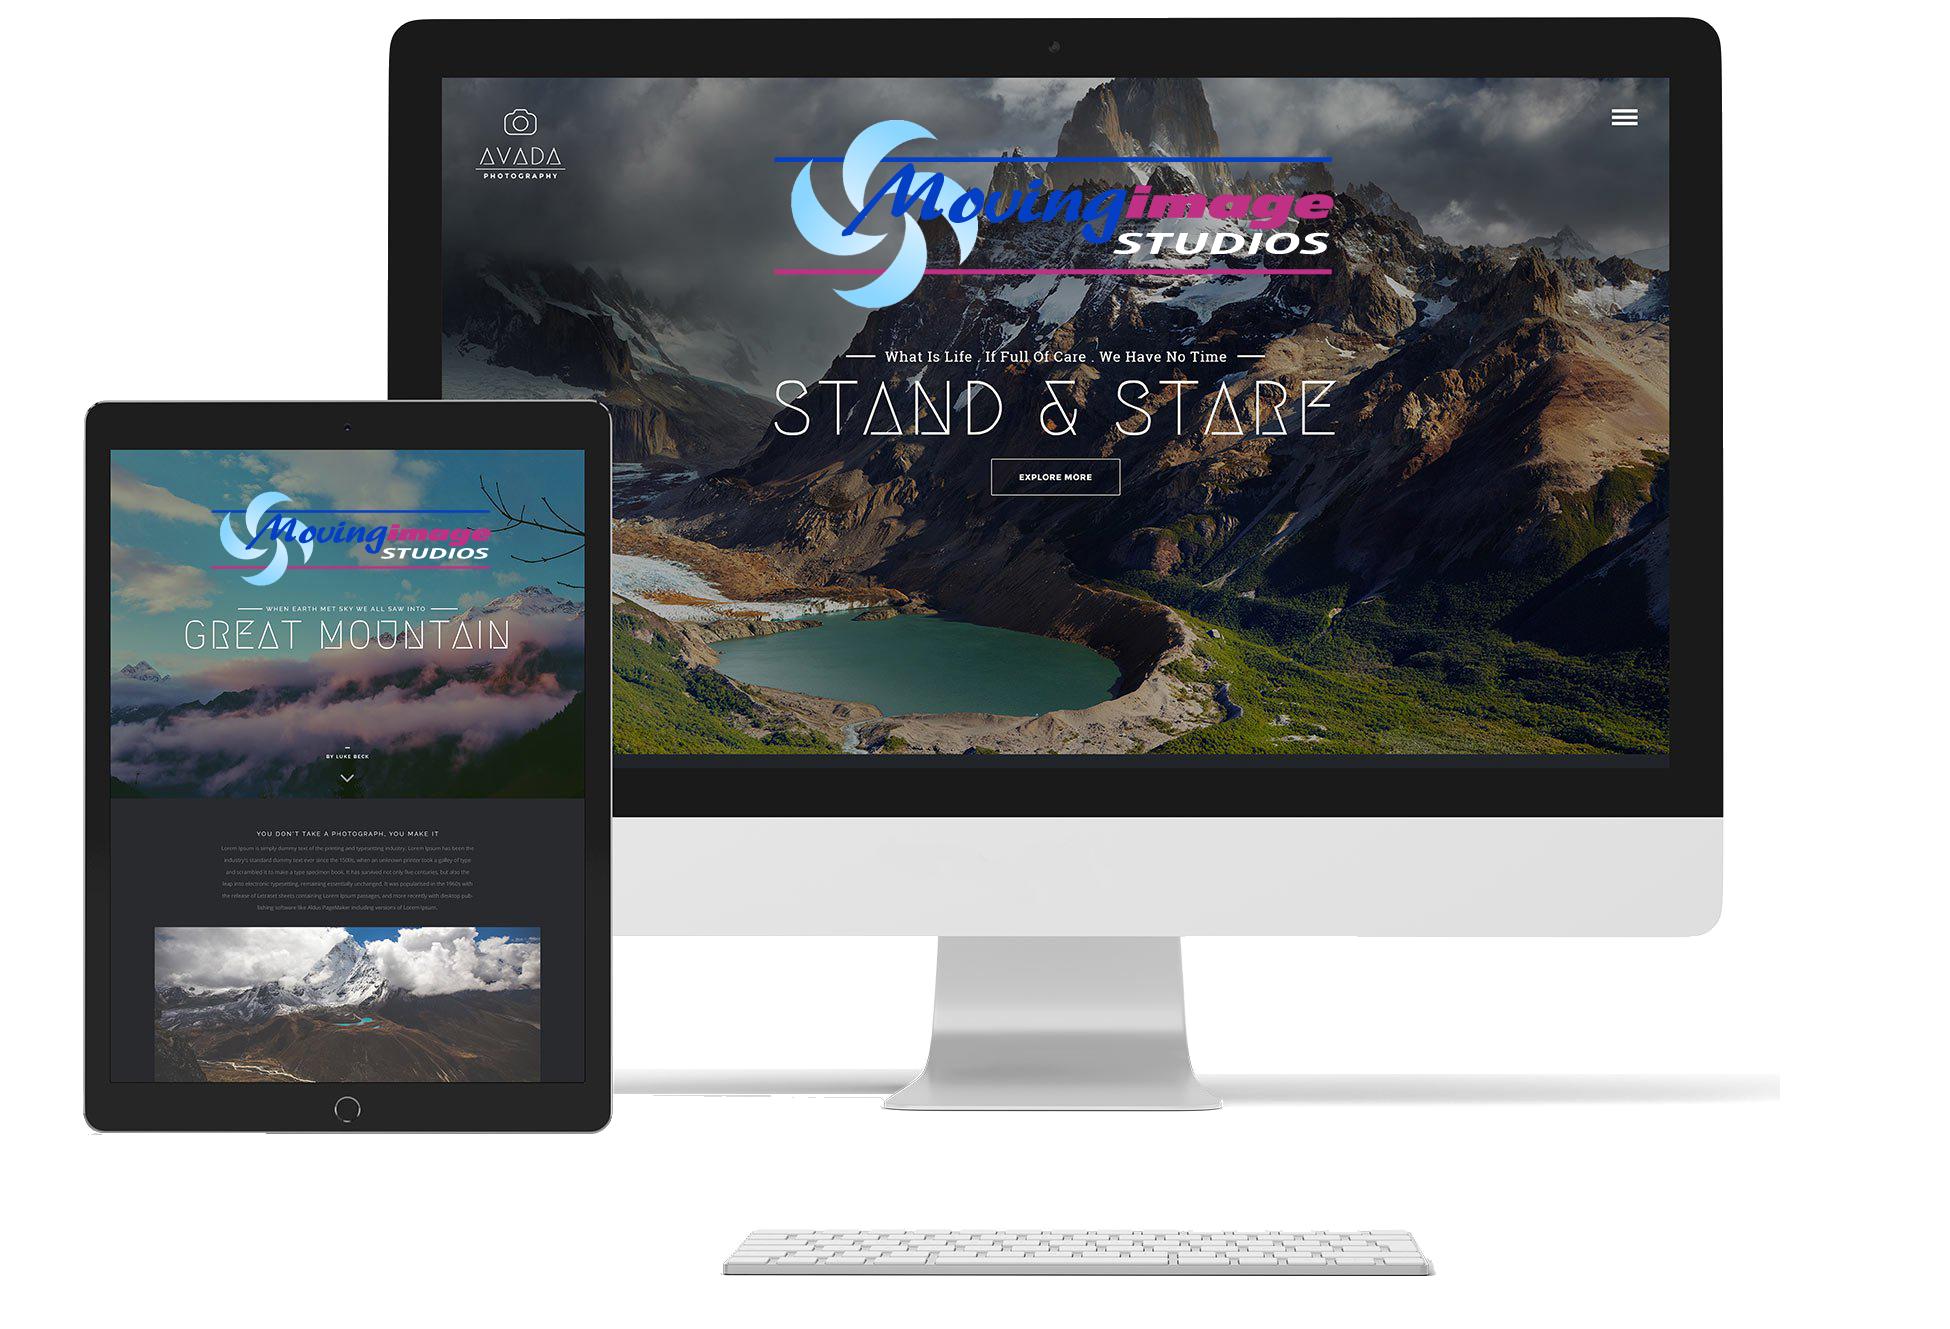 mac-computer-ipad-website-design